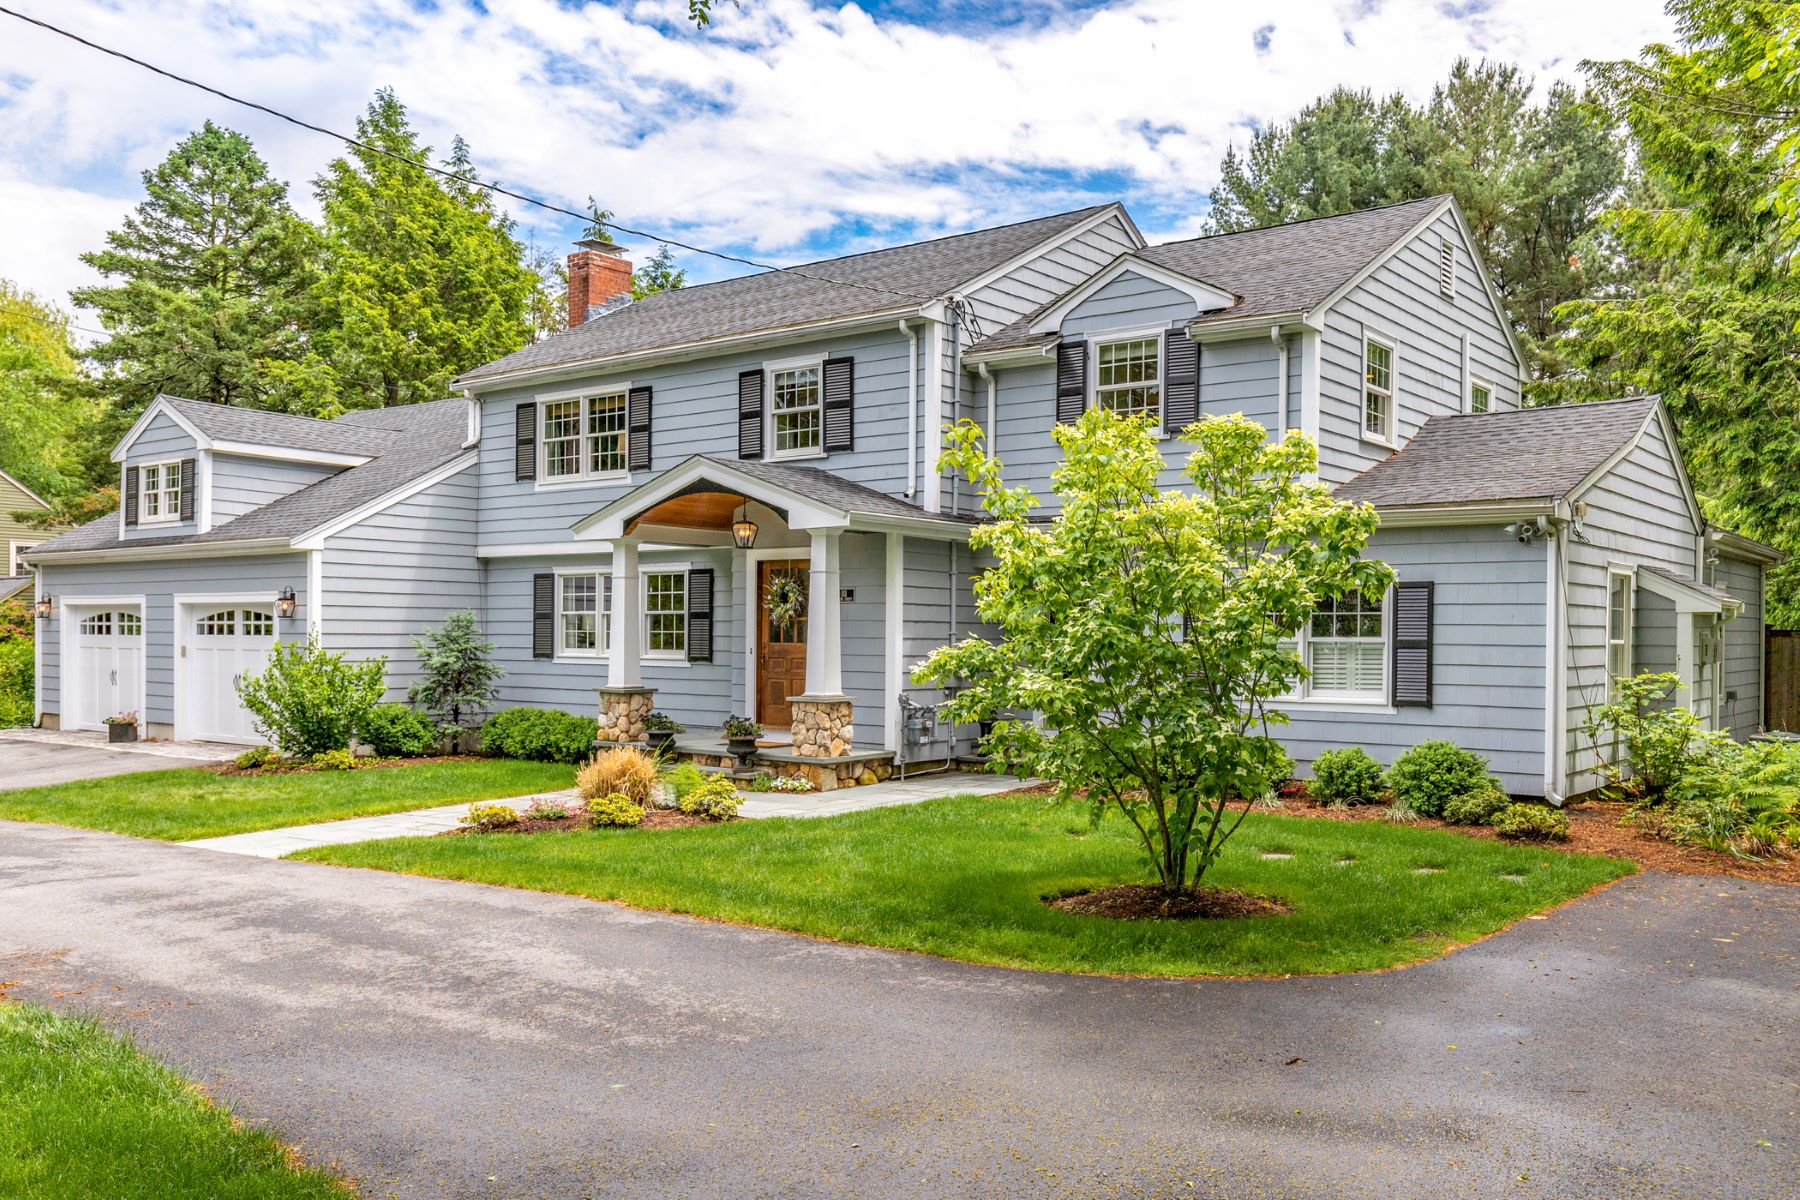 Single Family Homes for Sale at 111 Adams Street, Lexington 111 Adams St Lexington, Massachusetts 02420 United States